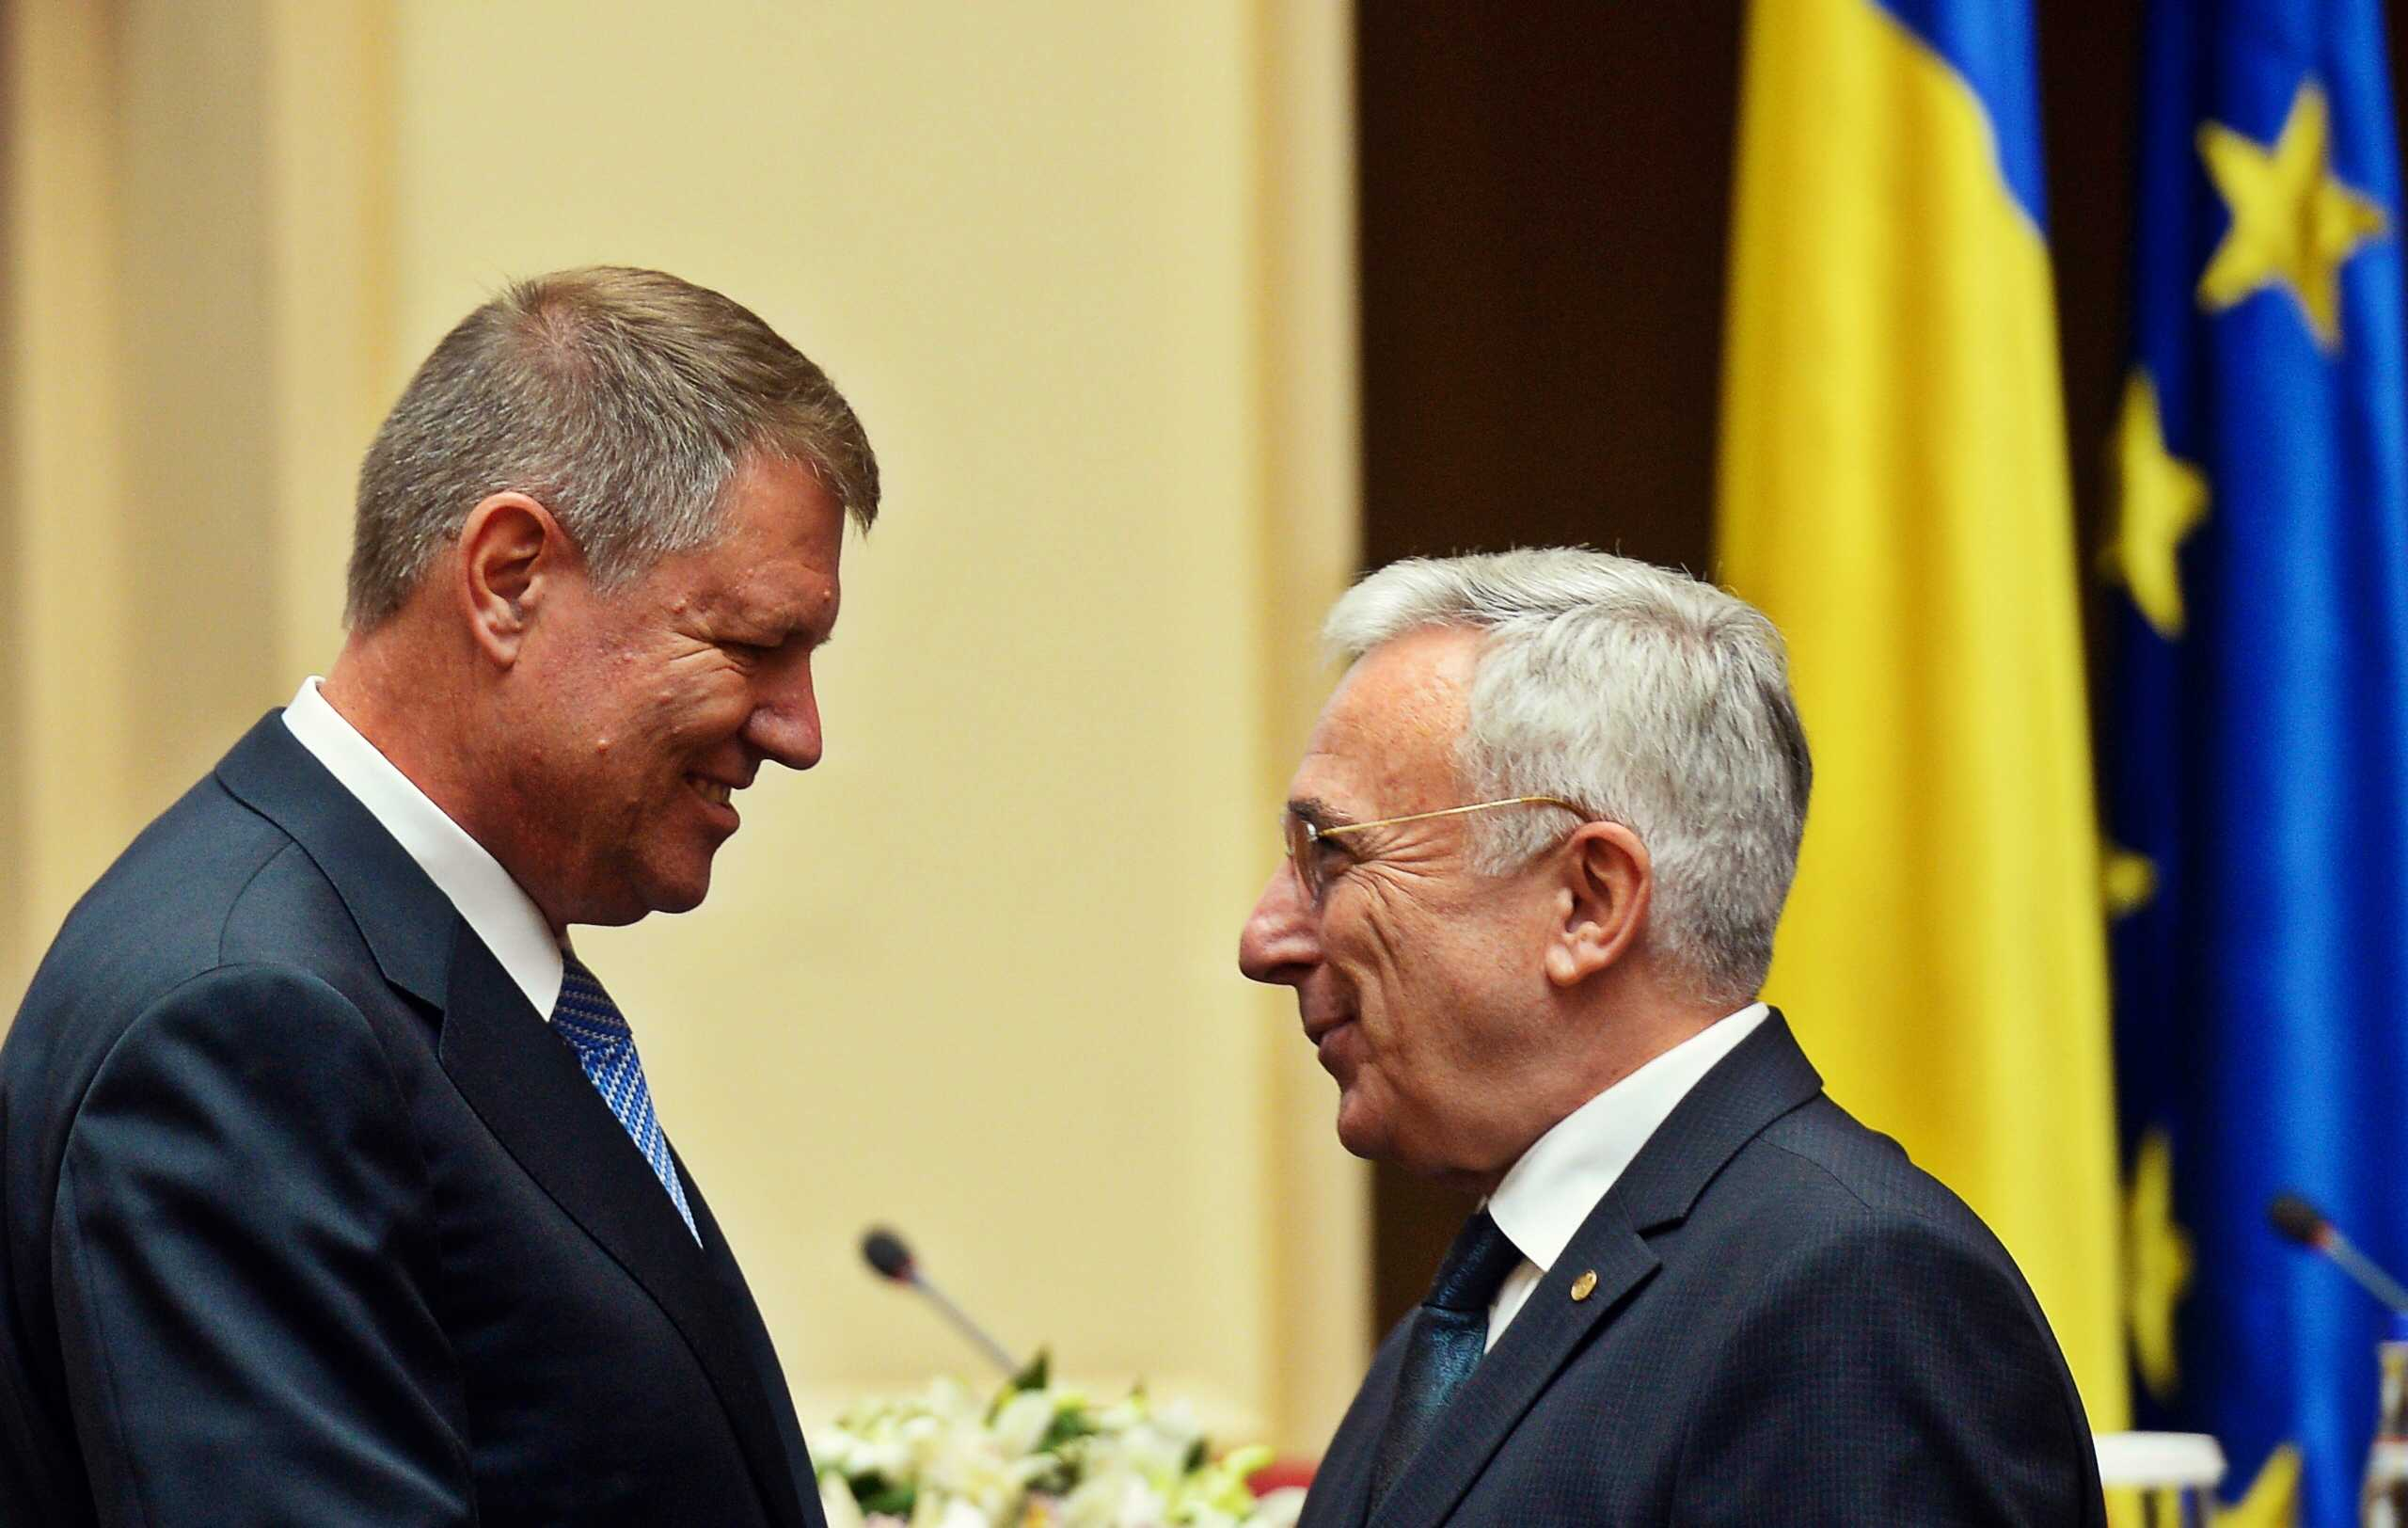 "OPERATIUNEA IN STIL MOSCOVIT ""FARA NOUL COD FISCAL!""/ Ilie Serbanescu: <i>""DATORIA PUBLICA A ROMANIEI E CREATA DE FIRMELE STRAINE""</i>/ Romania nu are sistem bancar propriu/ MUGUR ISARESCU – ACUZAT CA AR FI OFITER ACOPERIT"